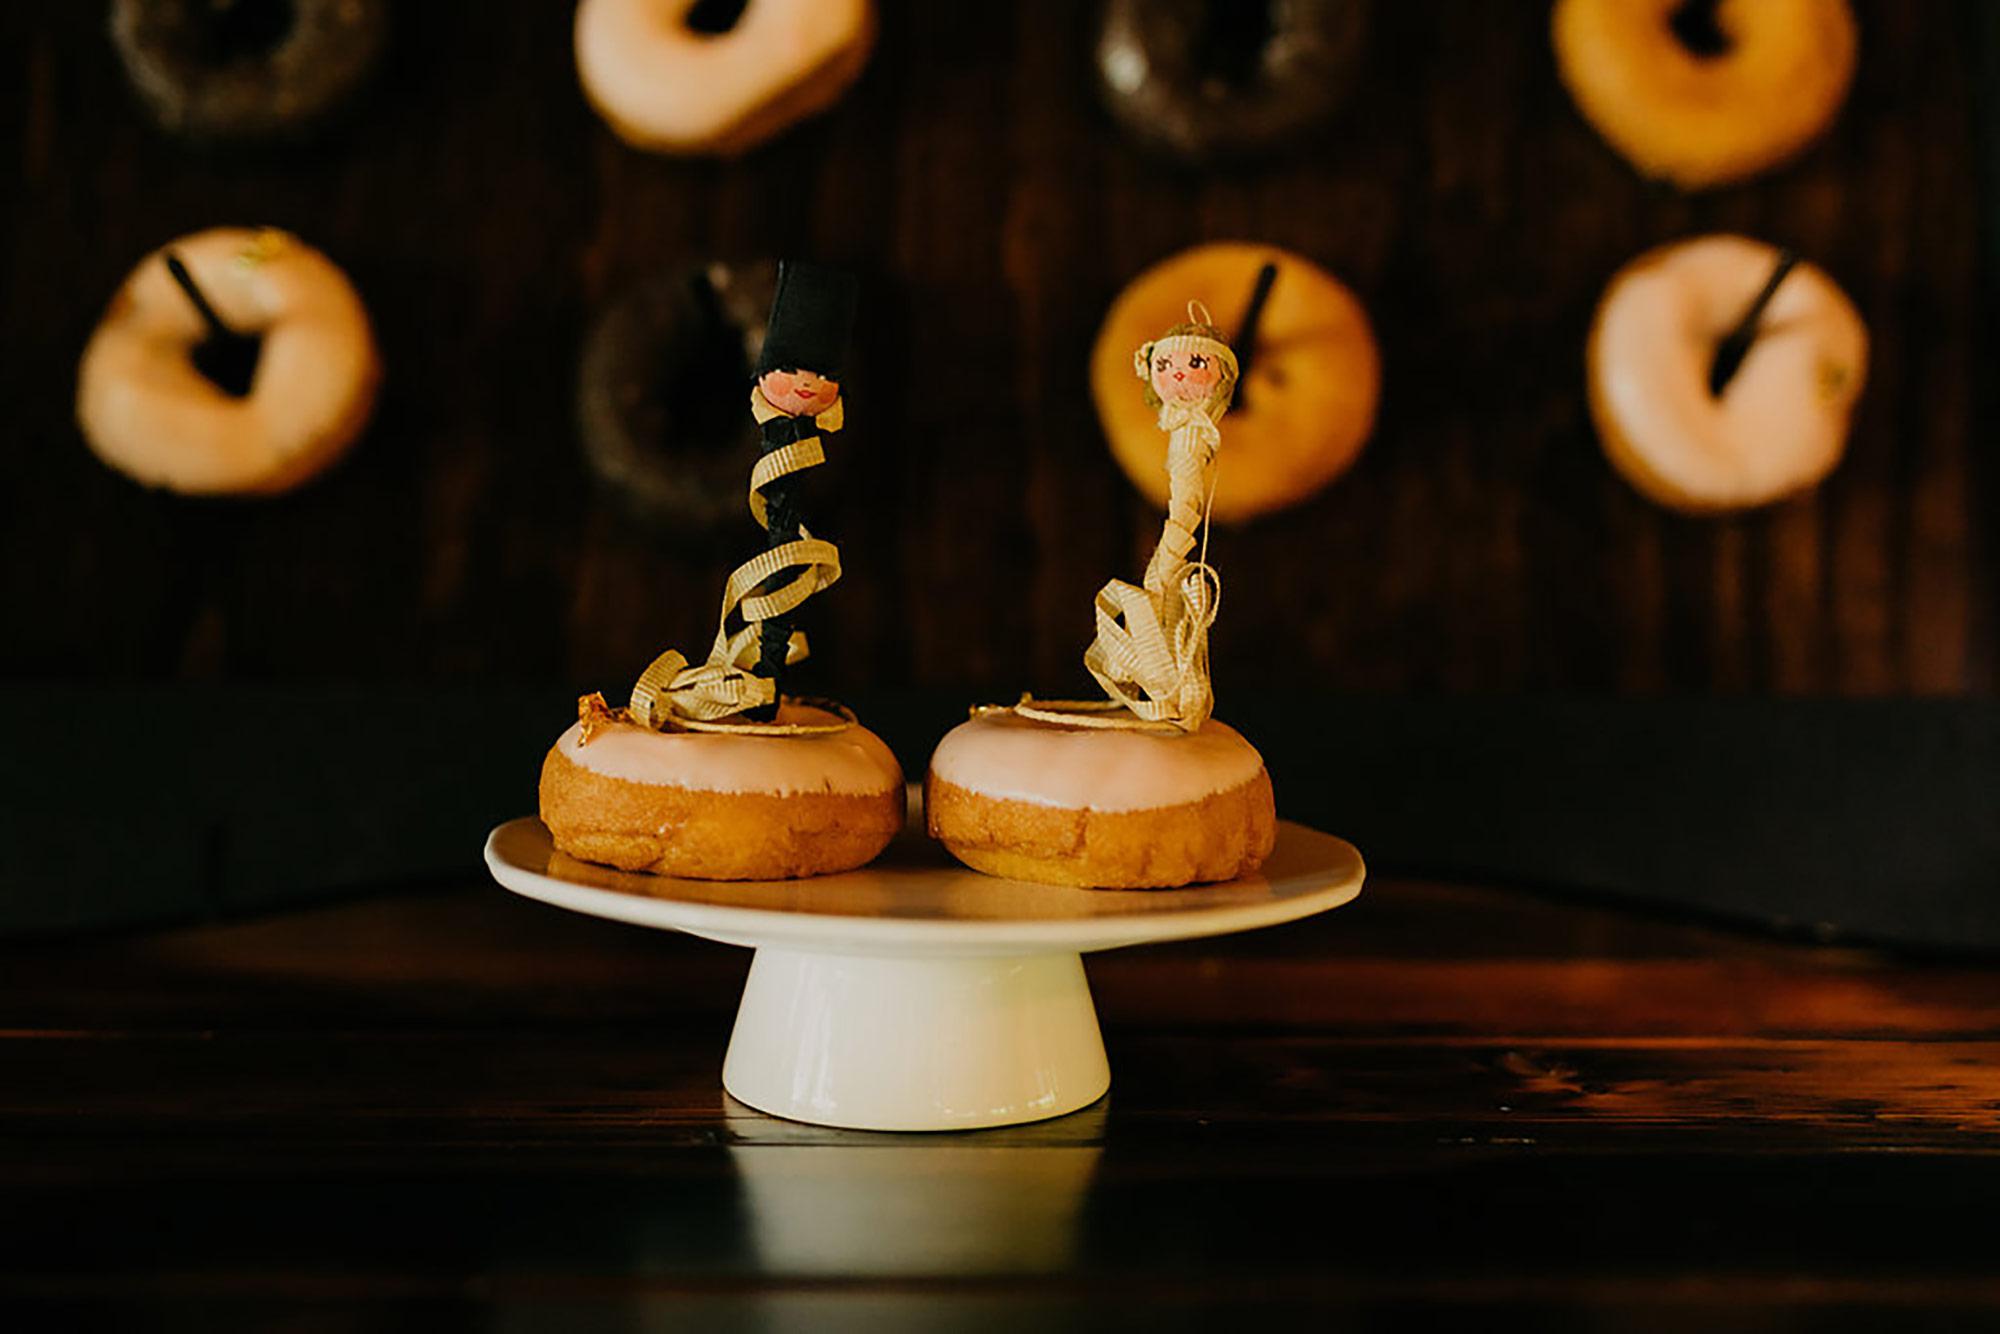 Kurtz-Orchards-Wedding-Niagara-wedding-Vineyard-Bride-Photography-by-Kayla-Rocca-038.JPG